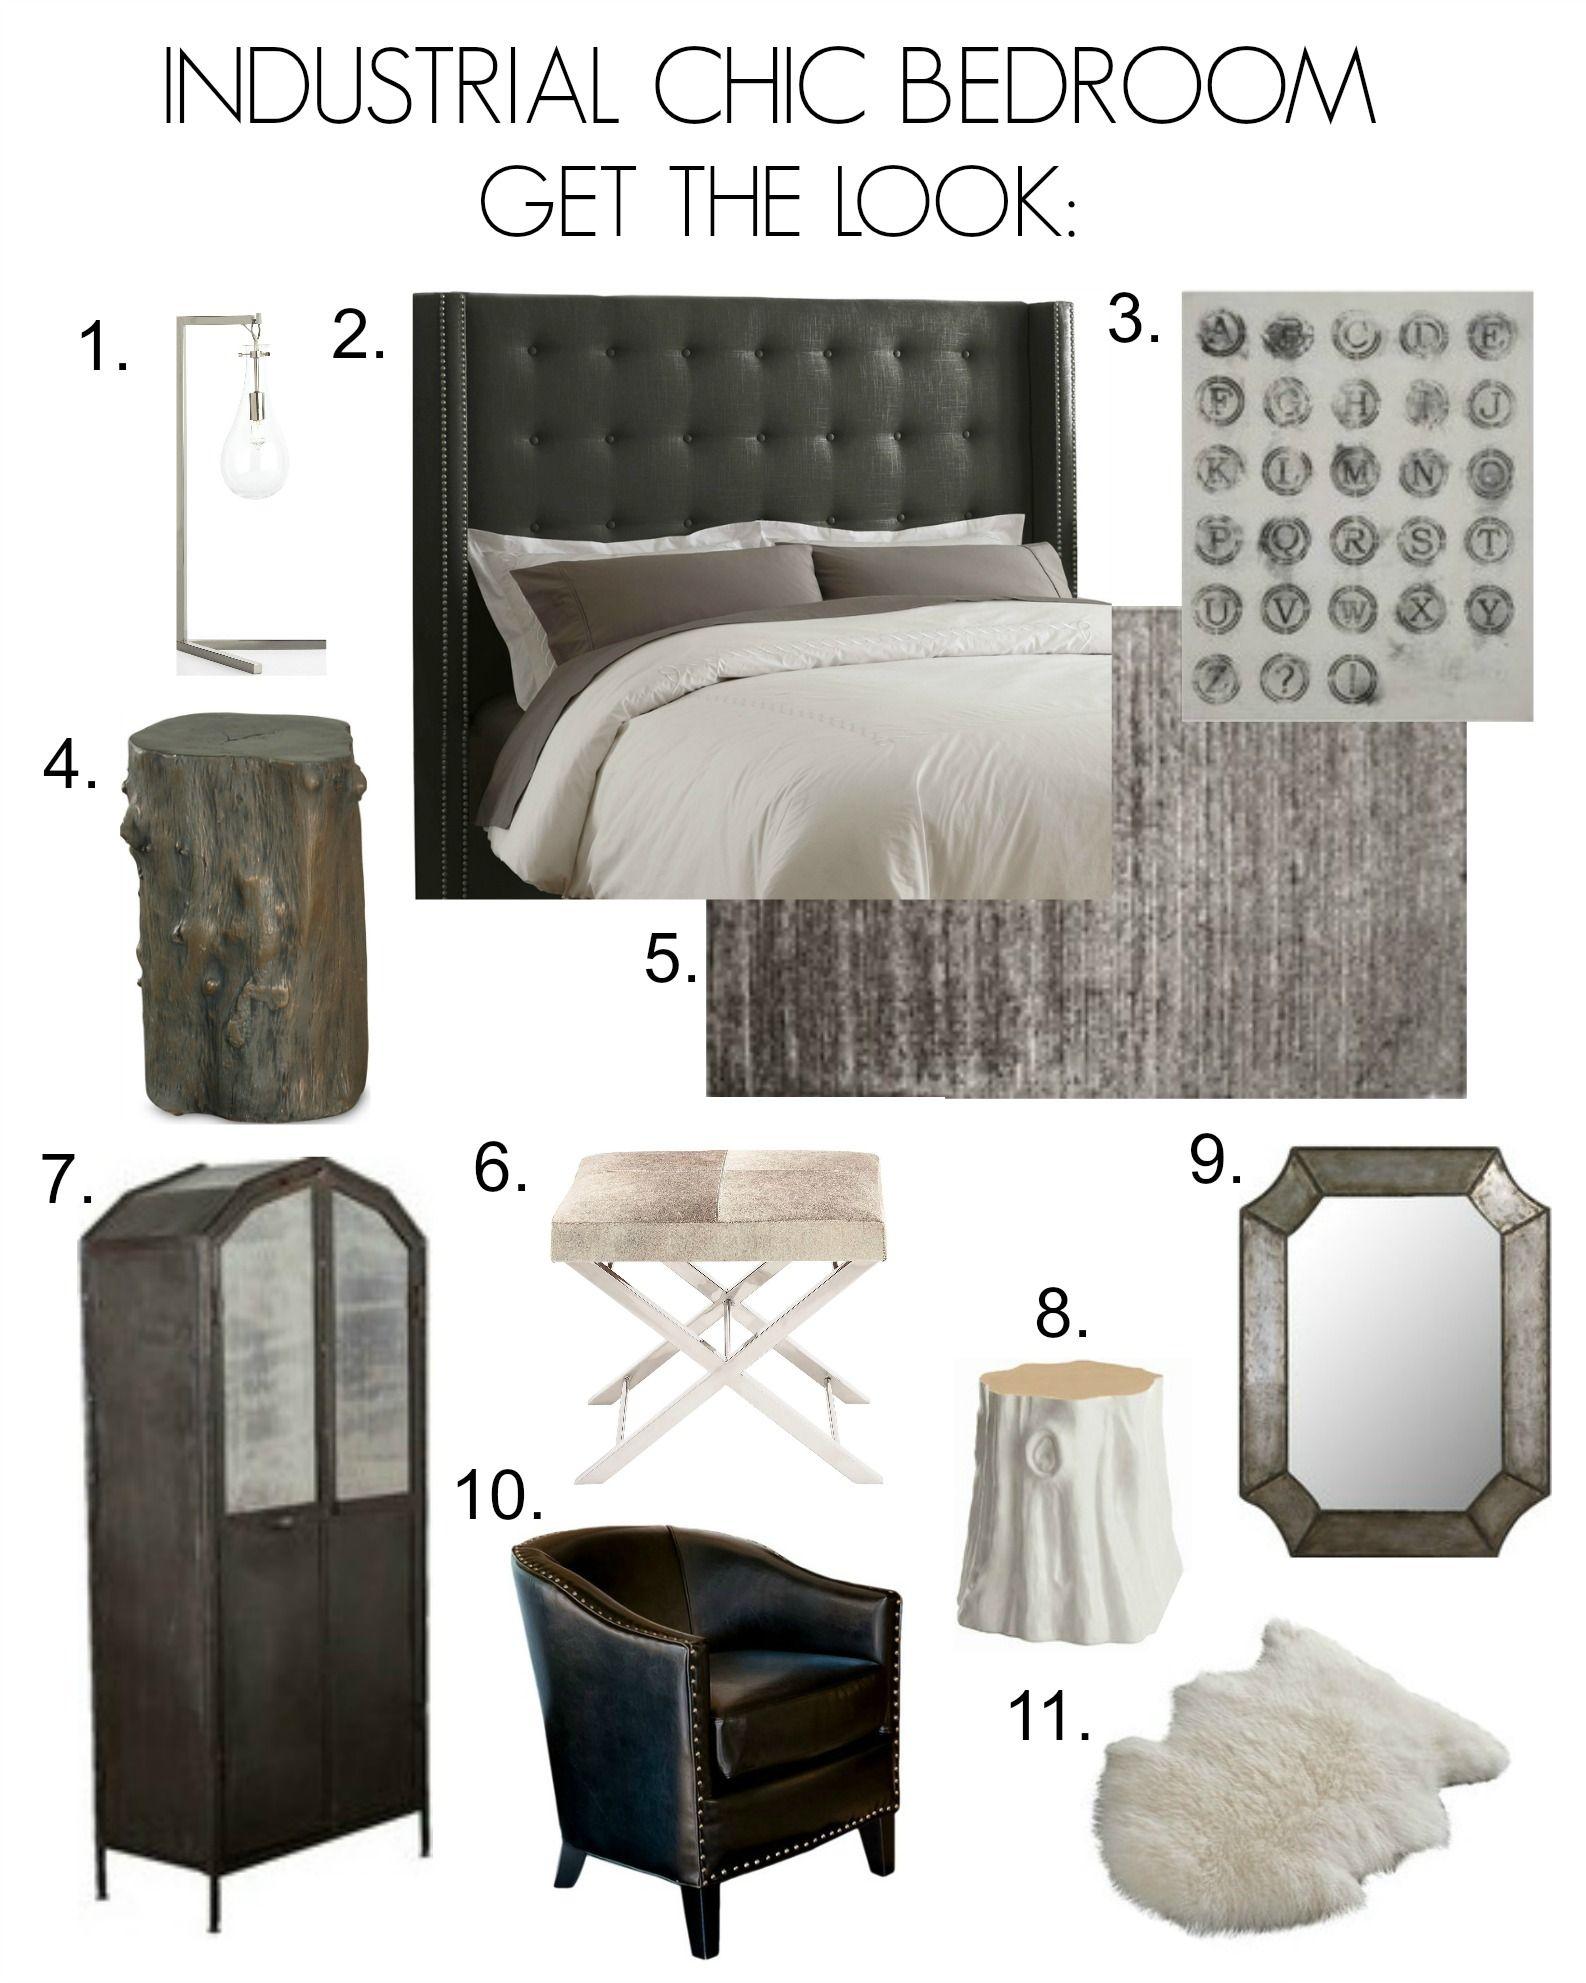 Industrial Chic Bedroom Inspiration Board Bedroom Industrial